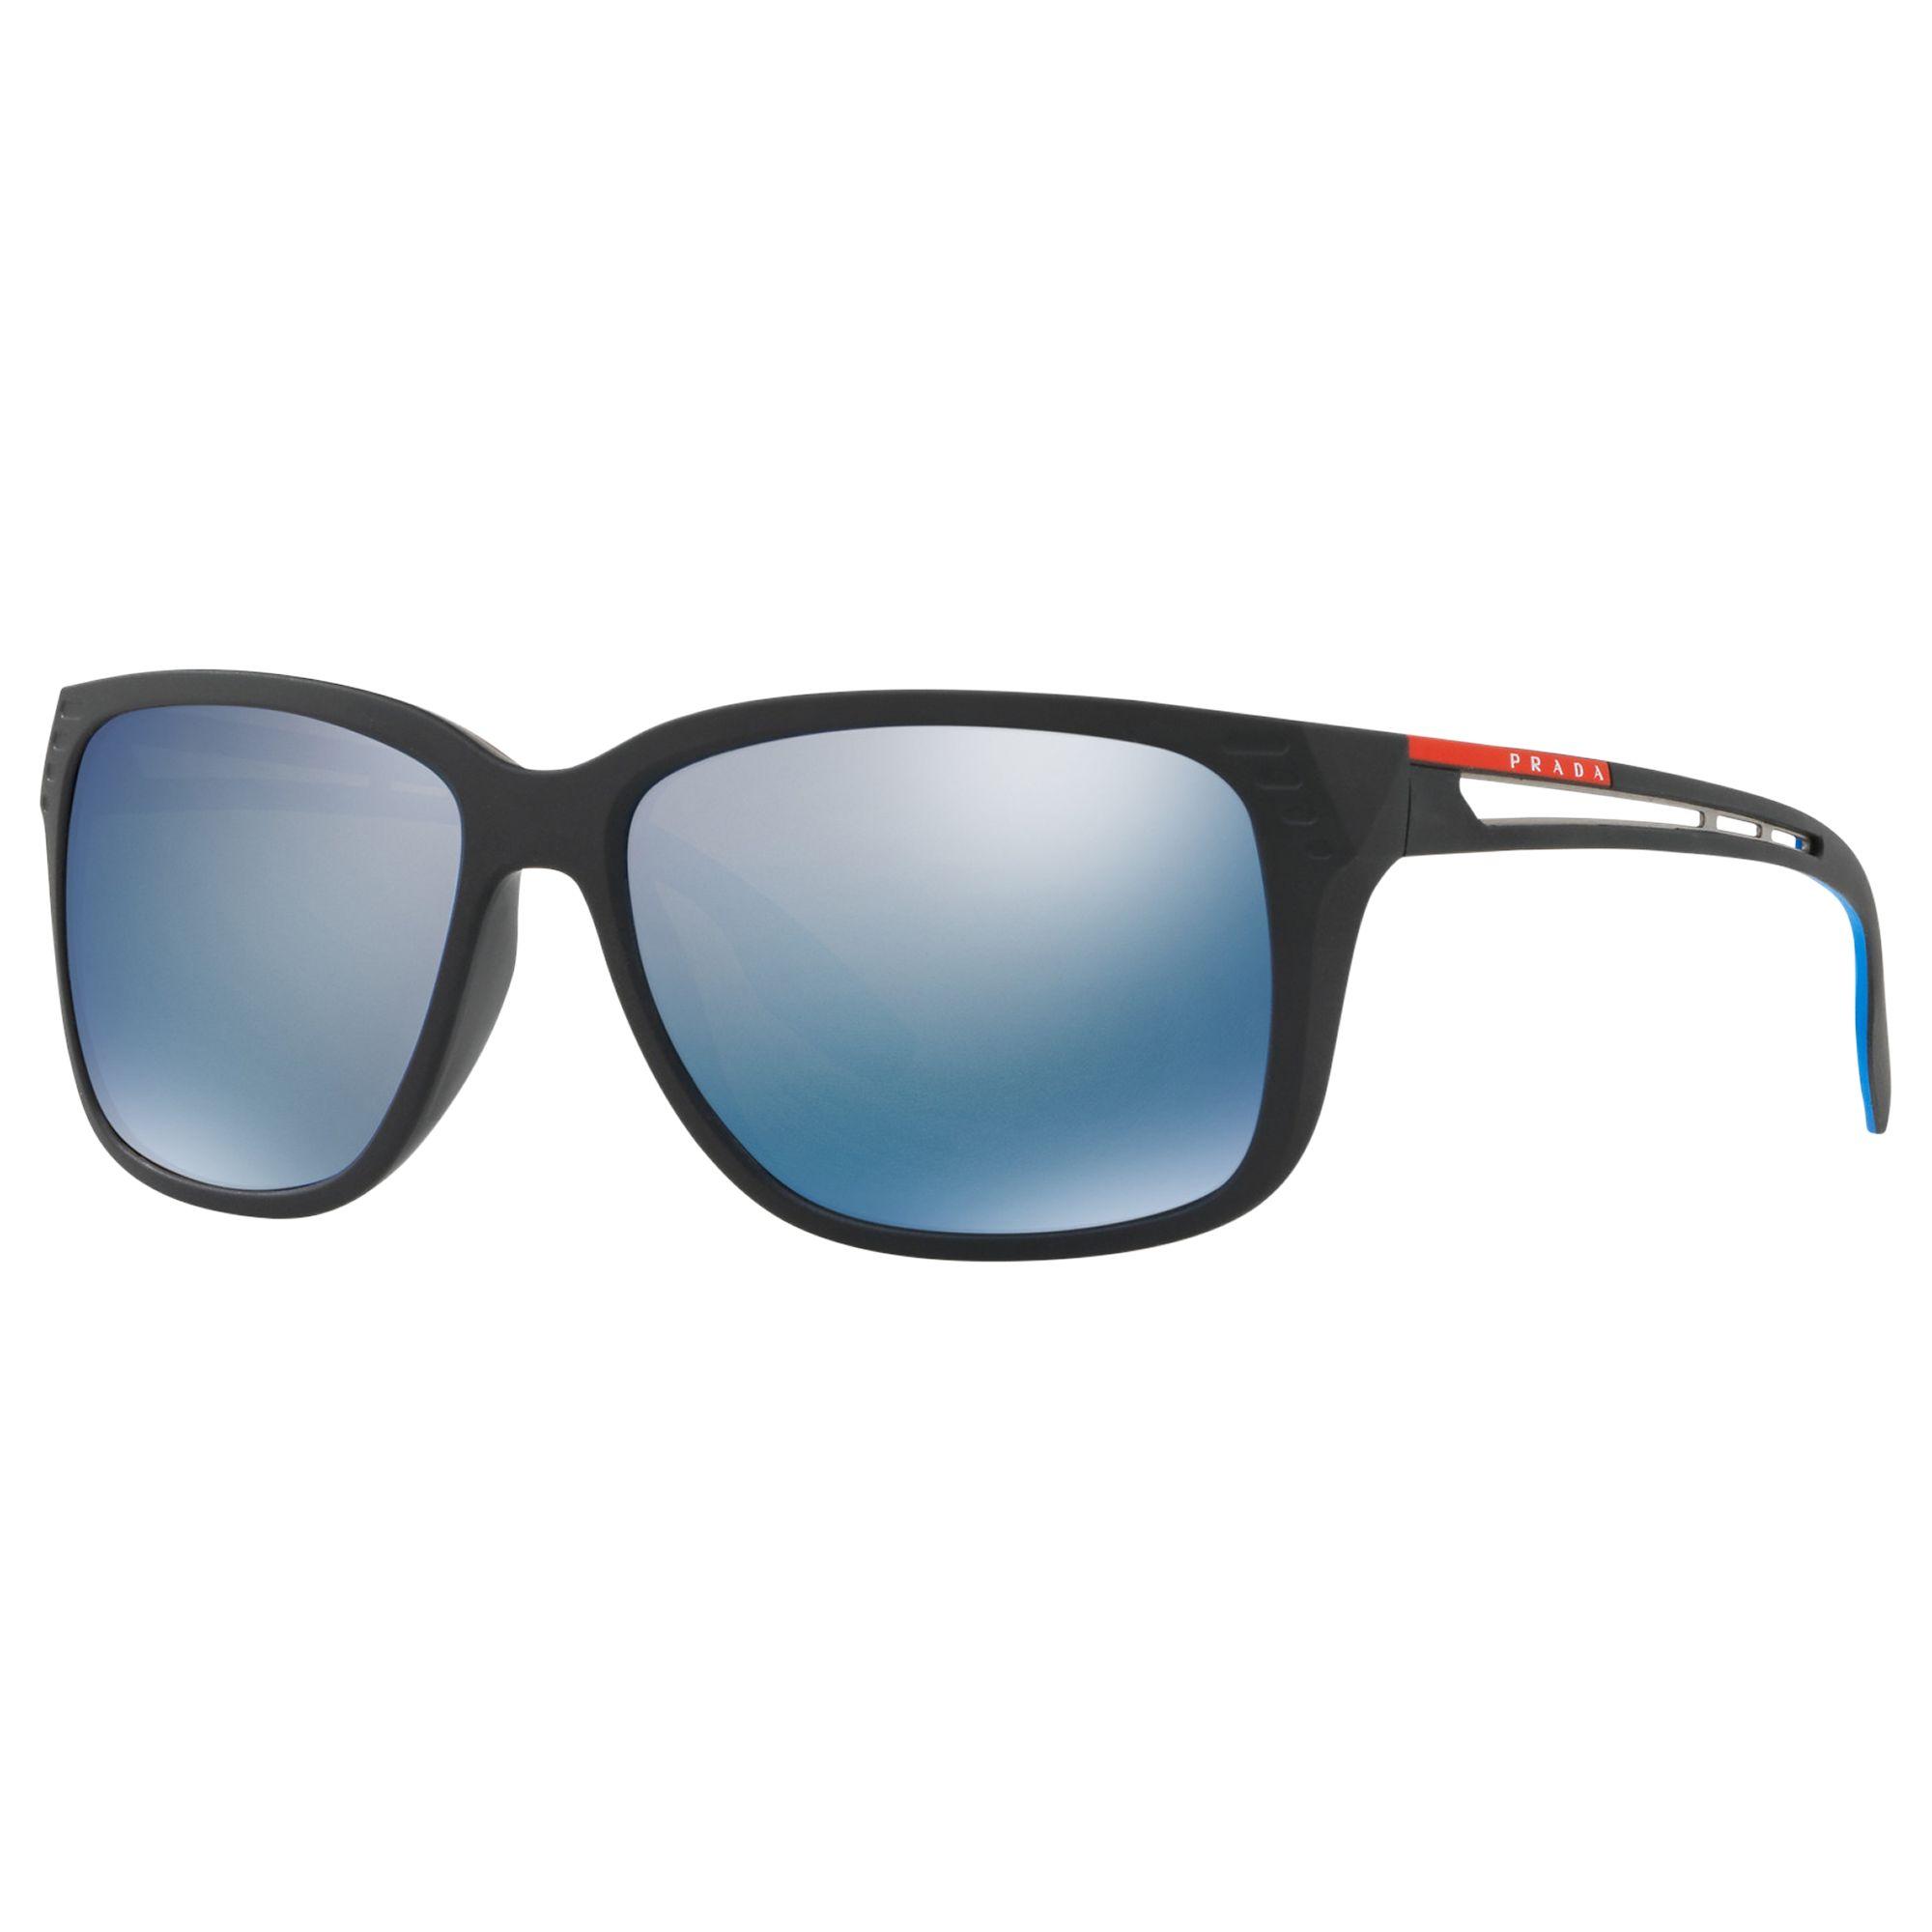 eba76cd29ee Prada Linea Rossa PS 03TS Men s Polarised Rectangular Sunglasses at John  Lewis   Partners